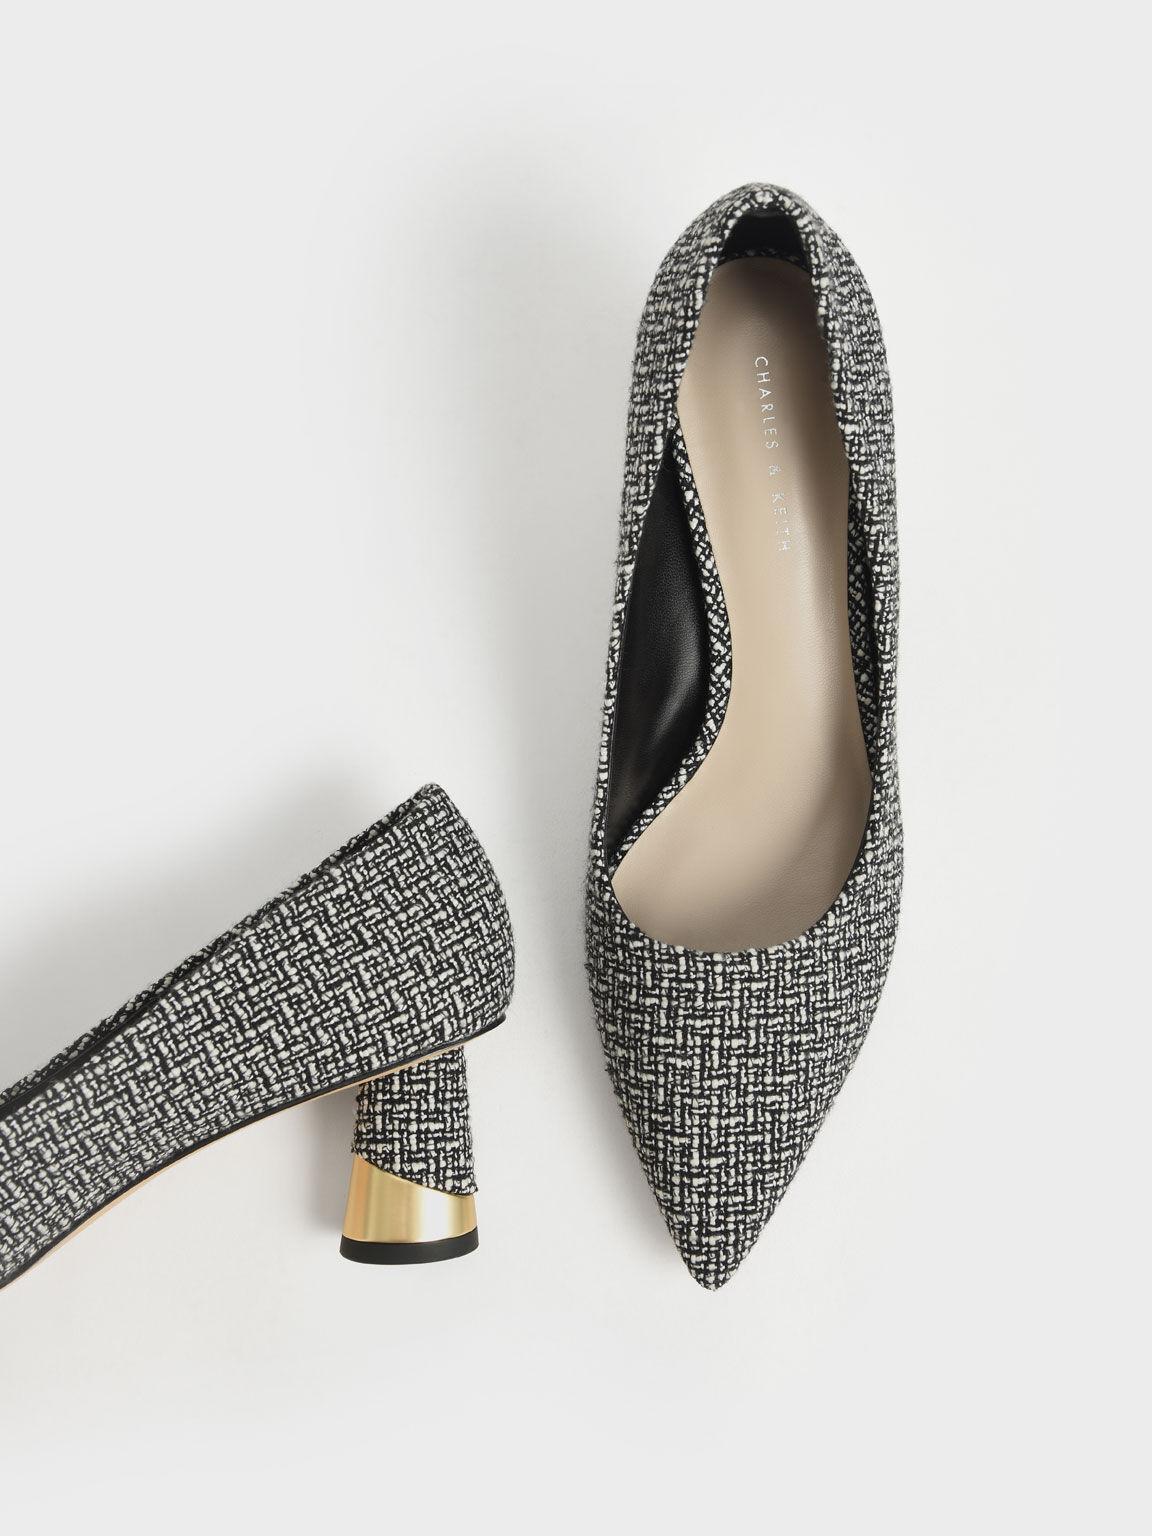 Metallic Sculptural Heel Tweed Pumps, Multi, hi-res